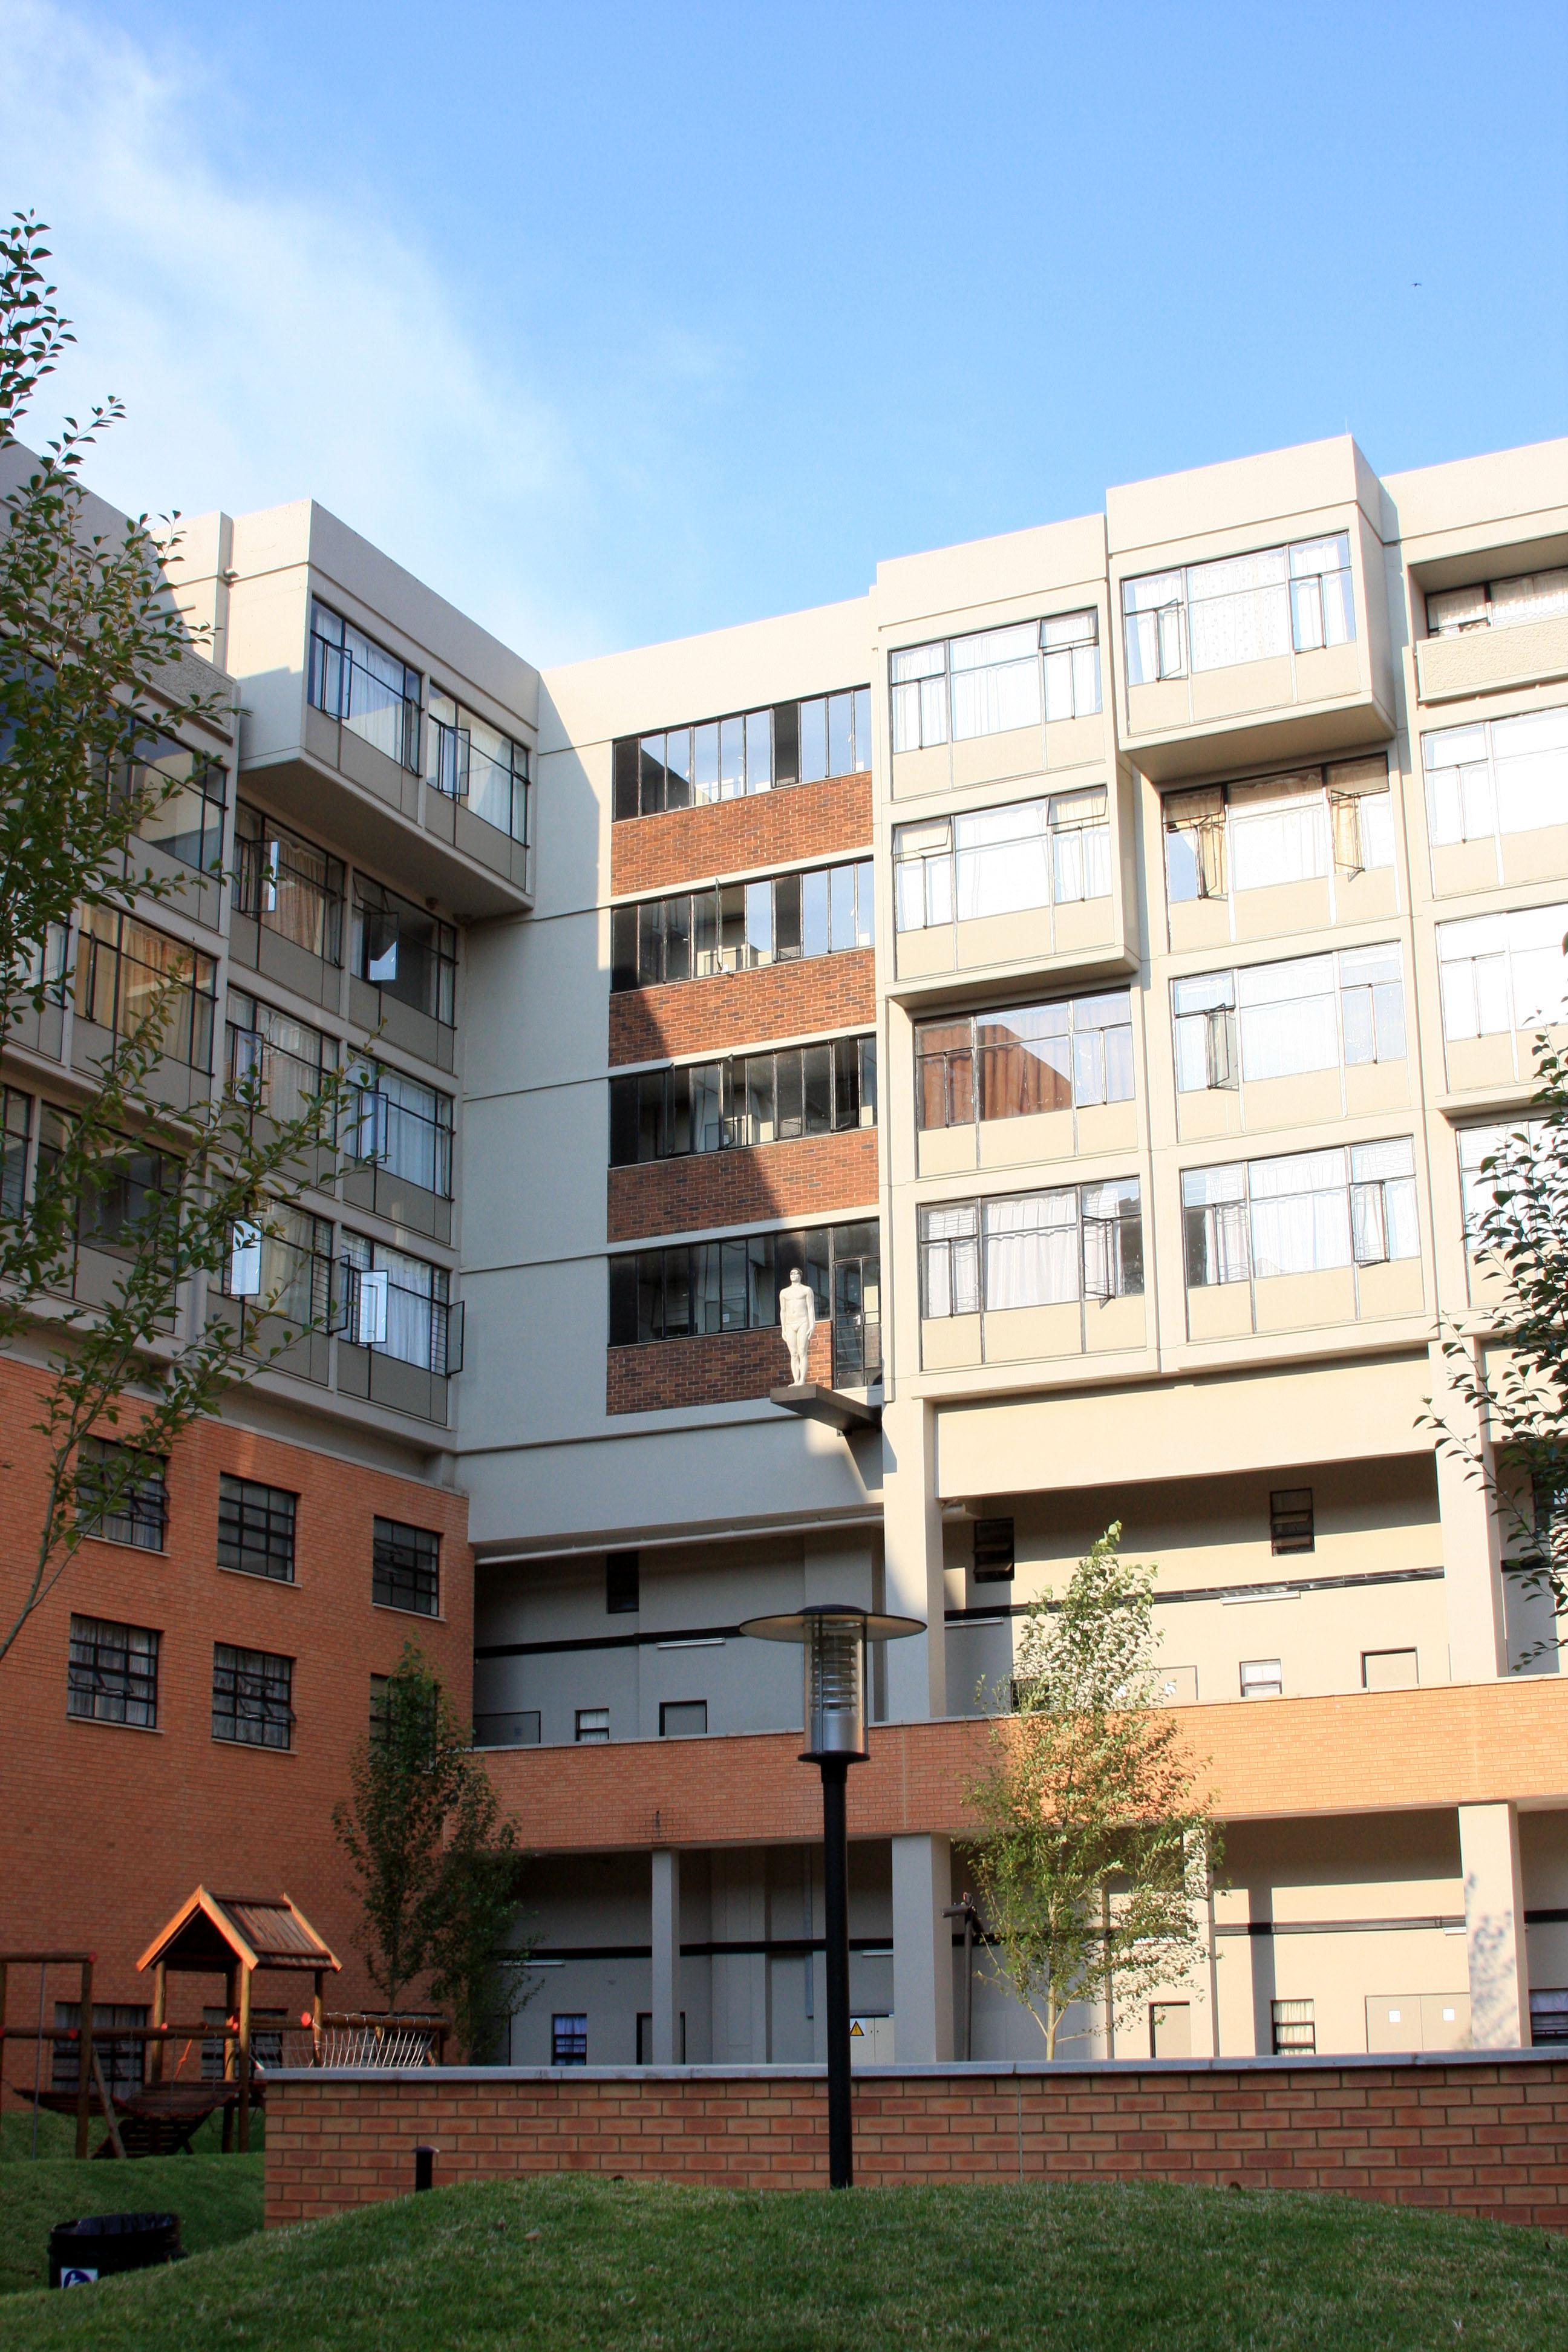 kempton_internal courtyard 1